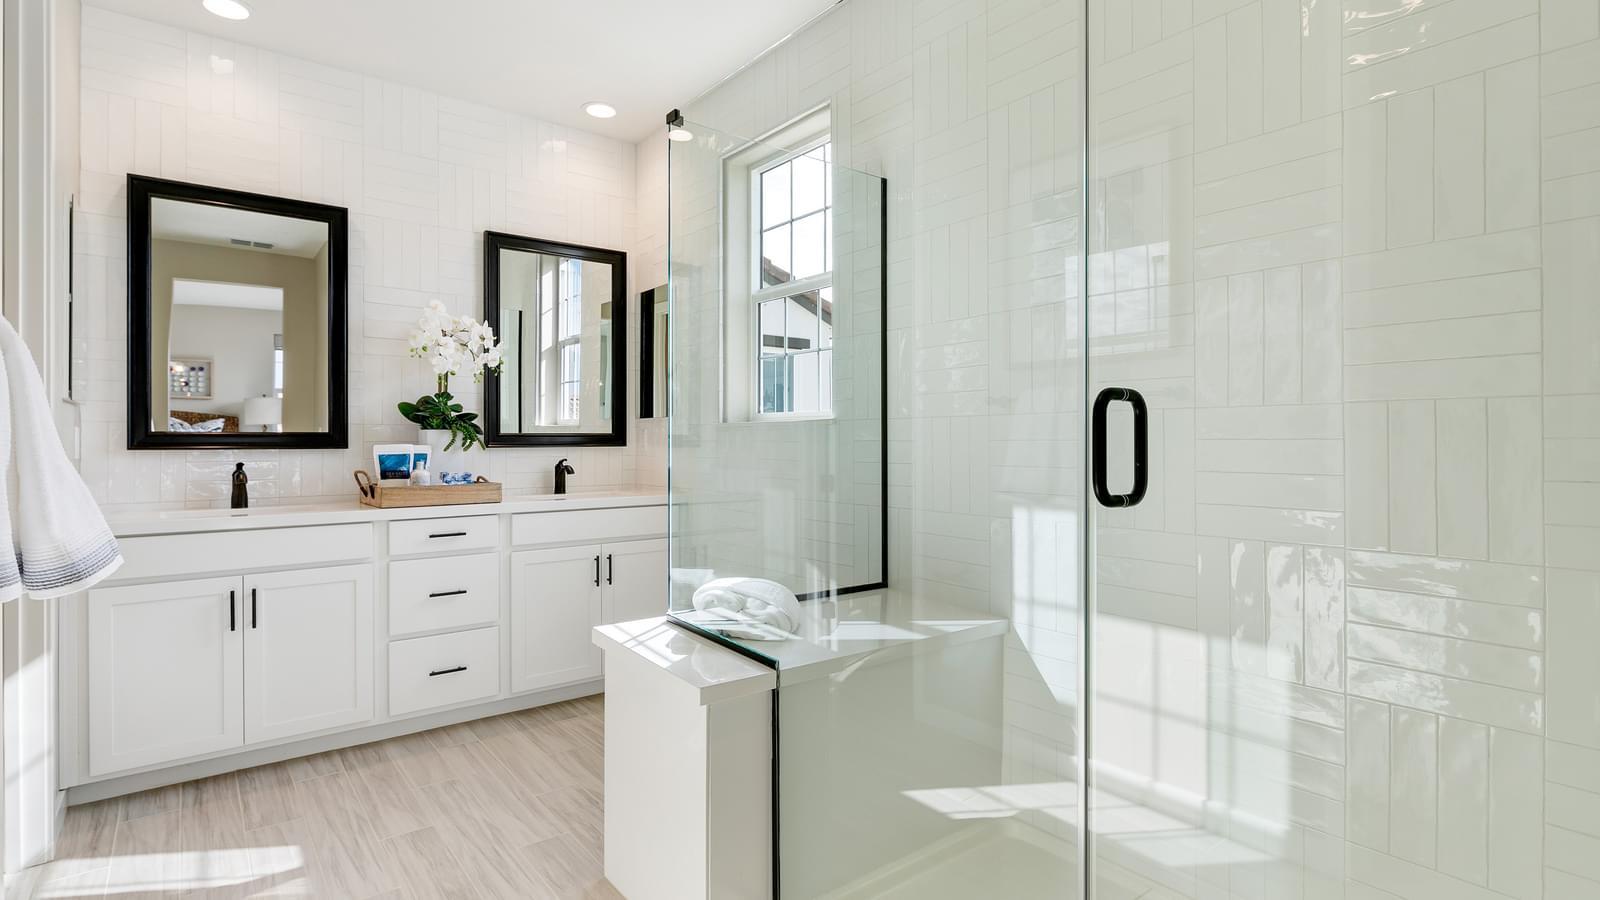 Residence 2 Master Bath